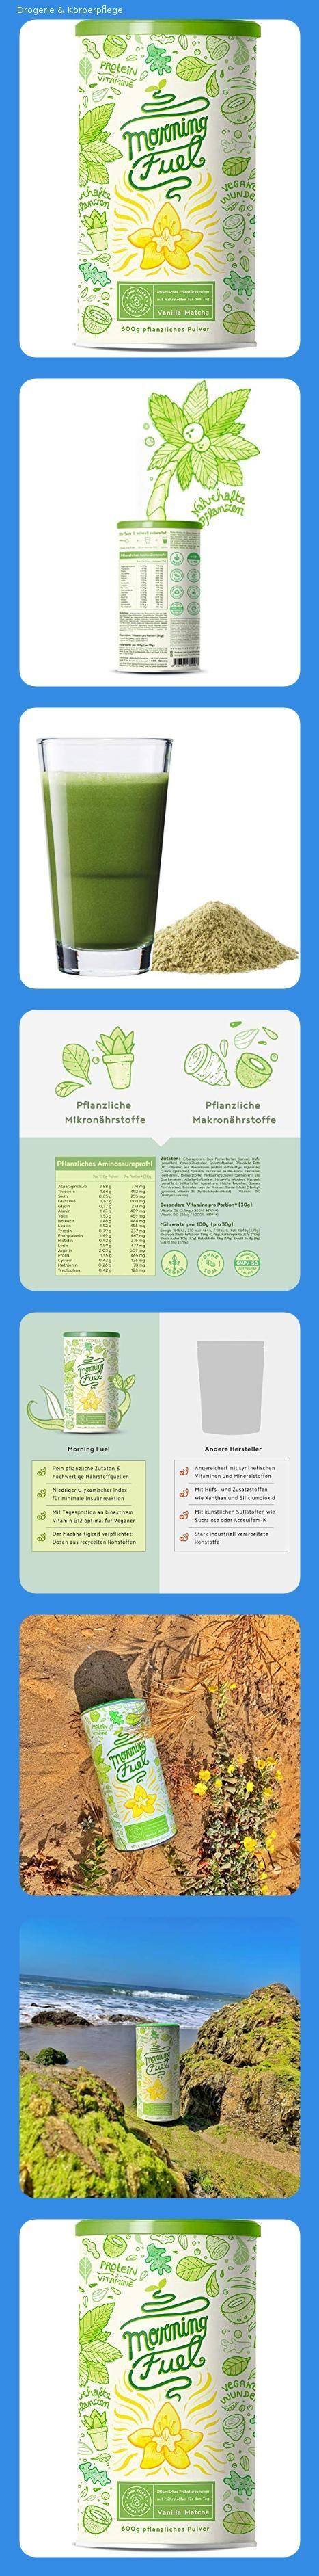 Morning Fuel Fruhstucksmischung Mit Mikro Makronahrstoffen